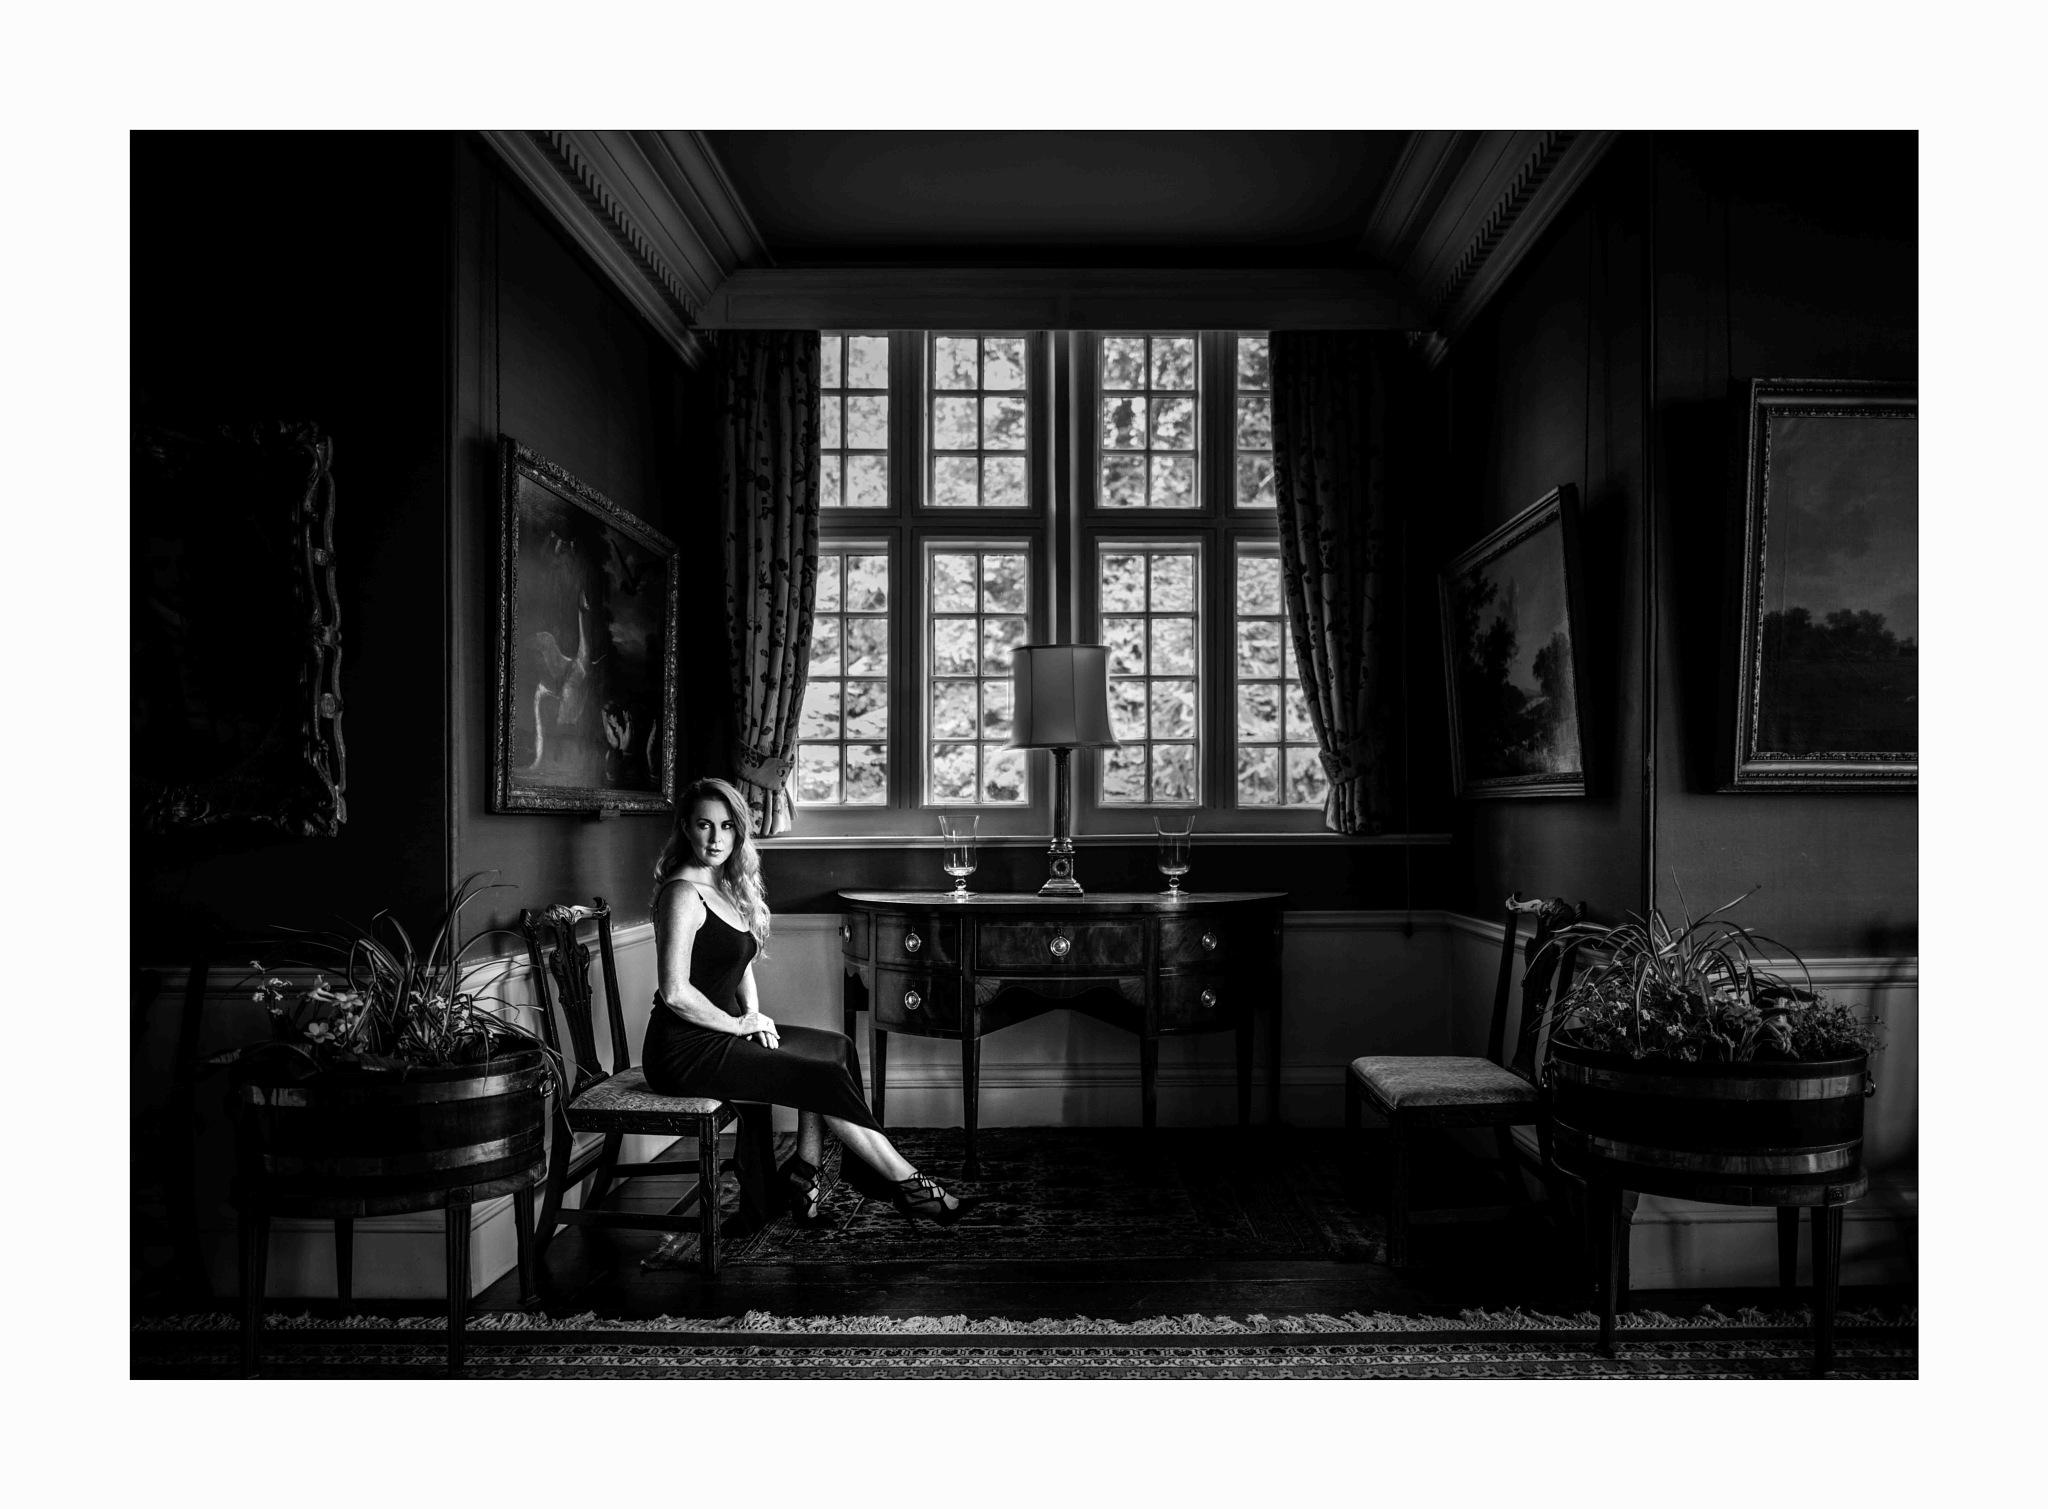 Waiting Room by Gavin Prest